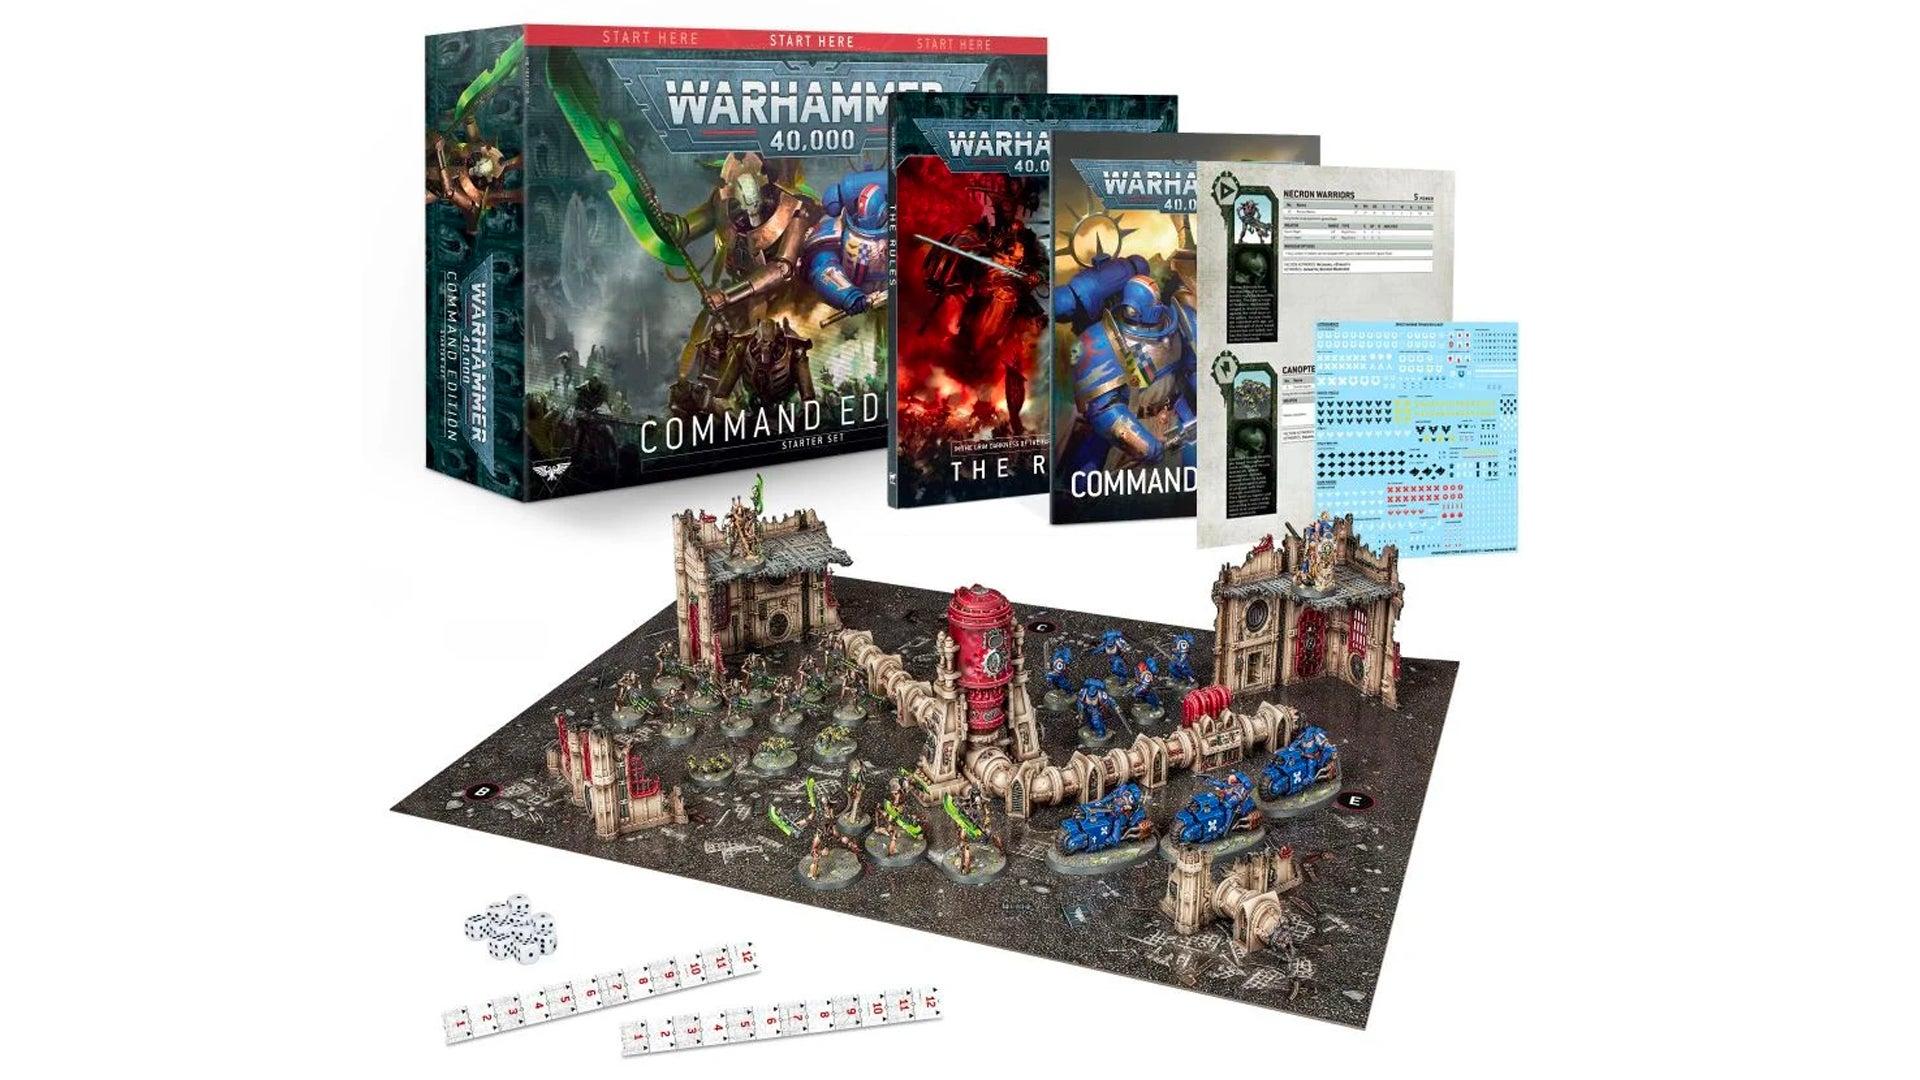 warhammer-40k-command-edition-box-set.jpg